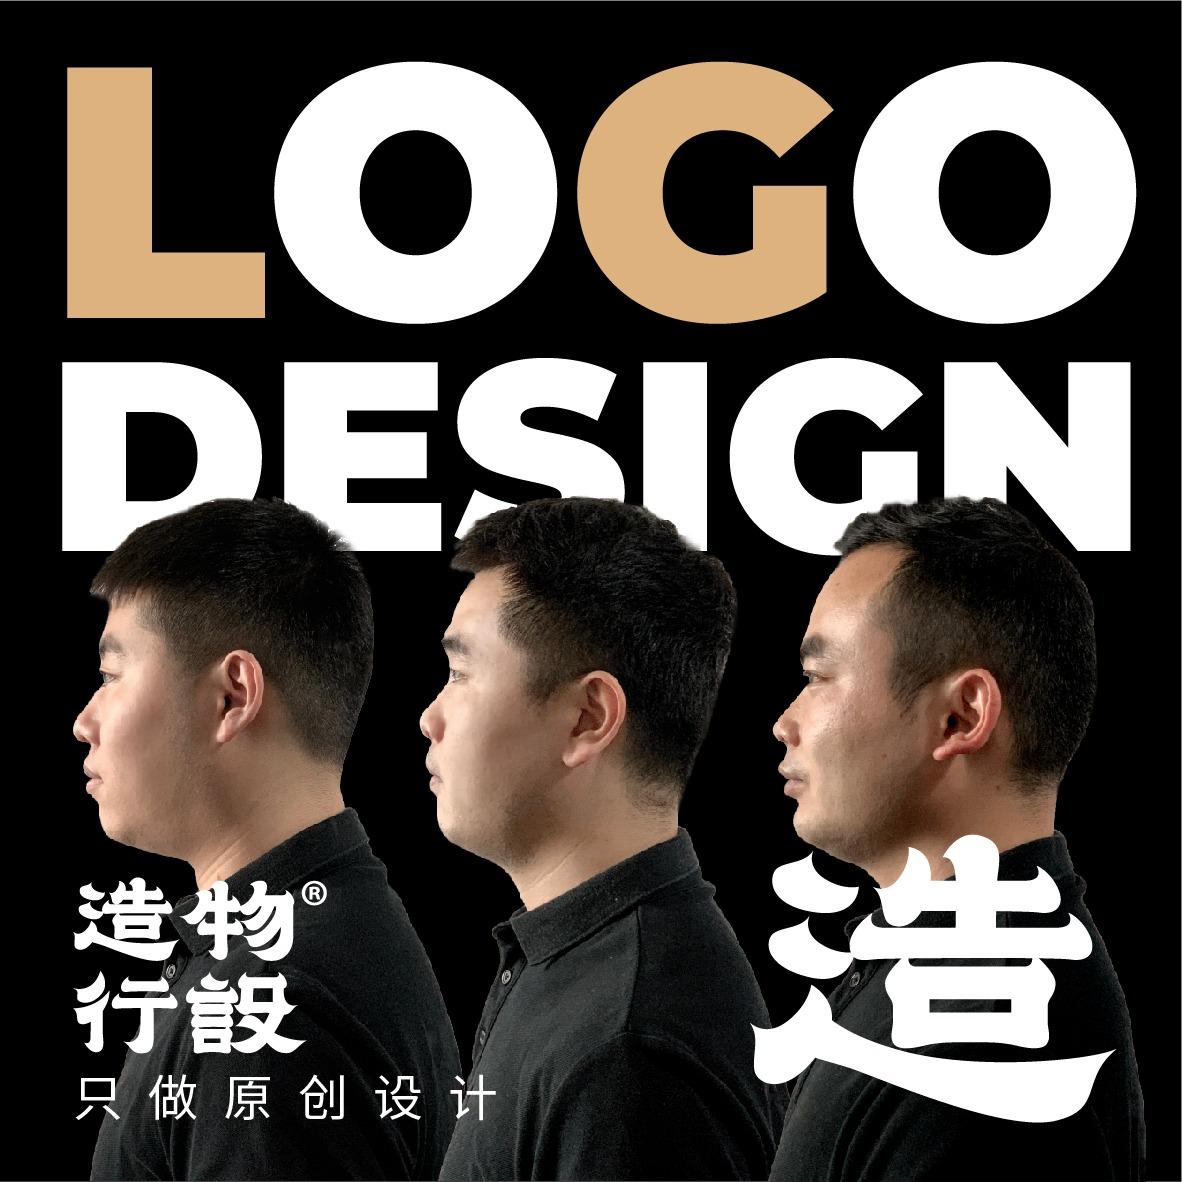 logo设计吉祥物人物形象图文英文餐饮农产品房地产美容协会